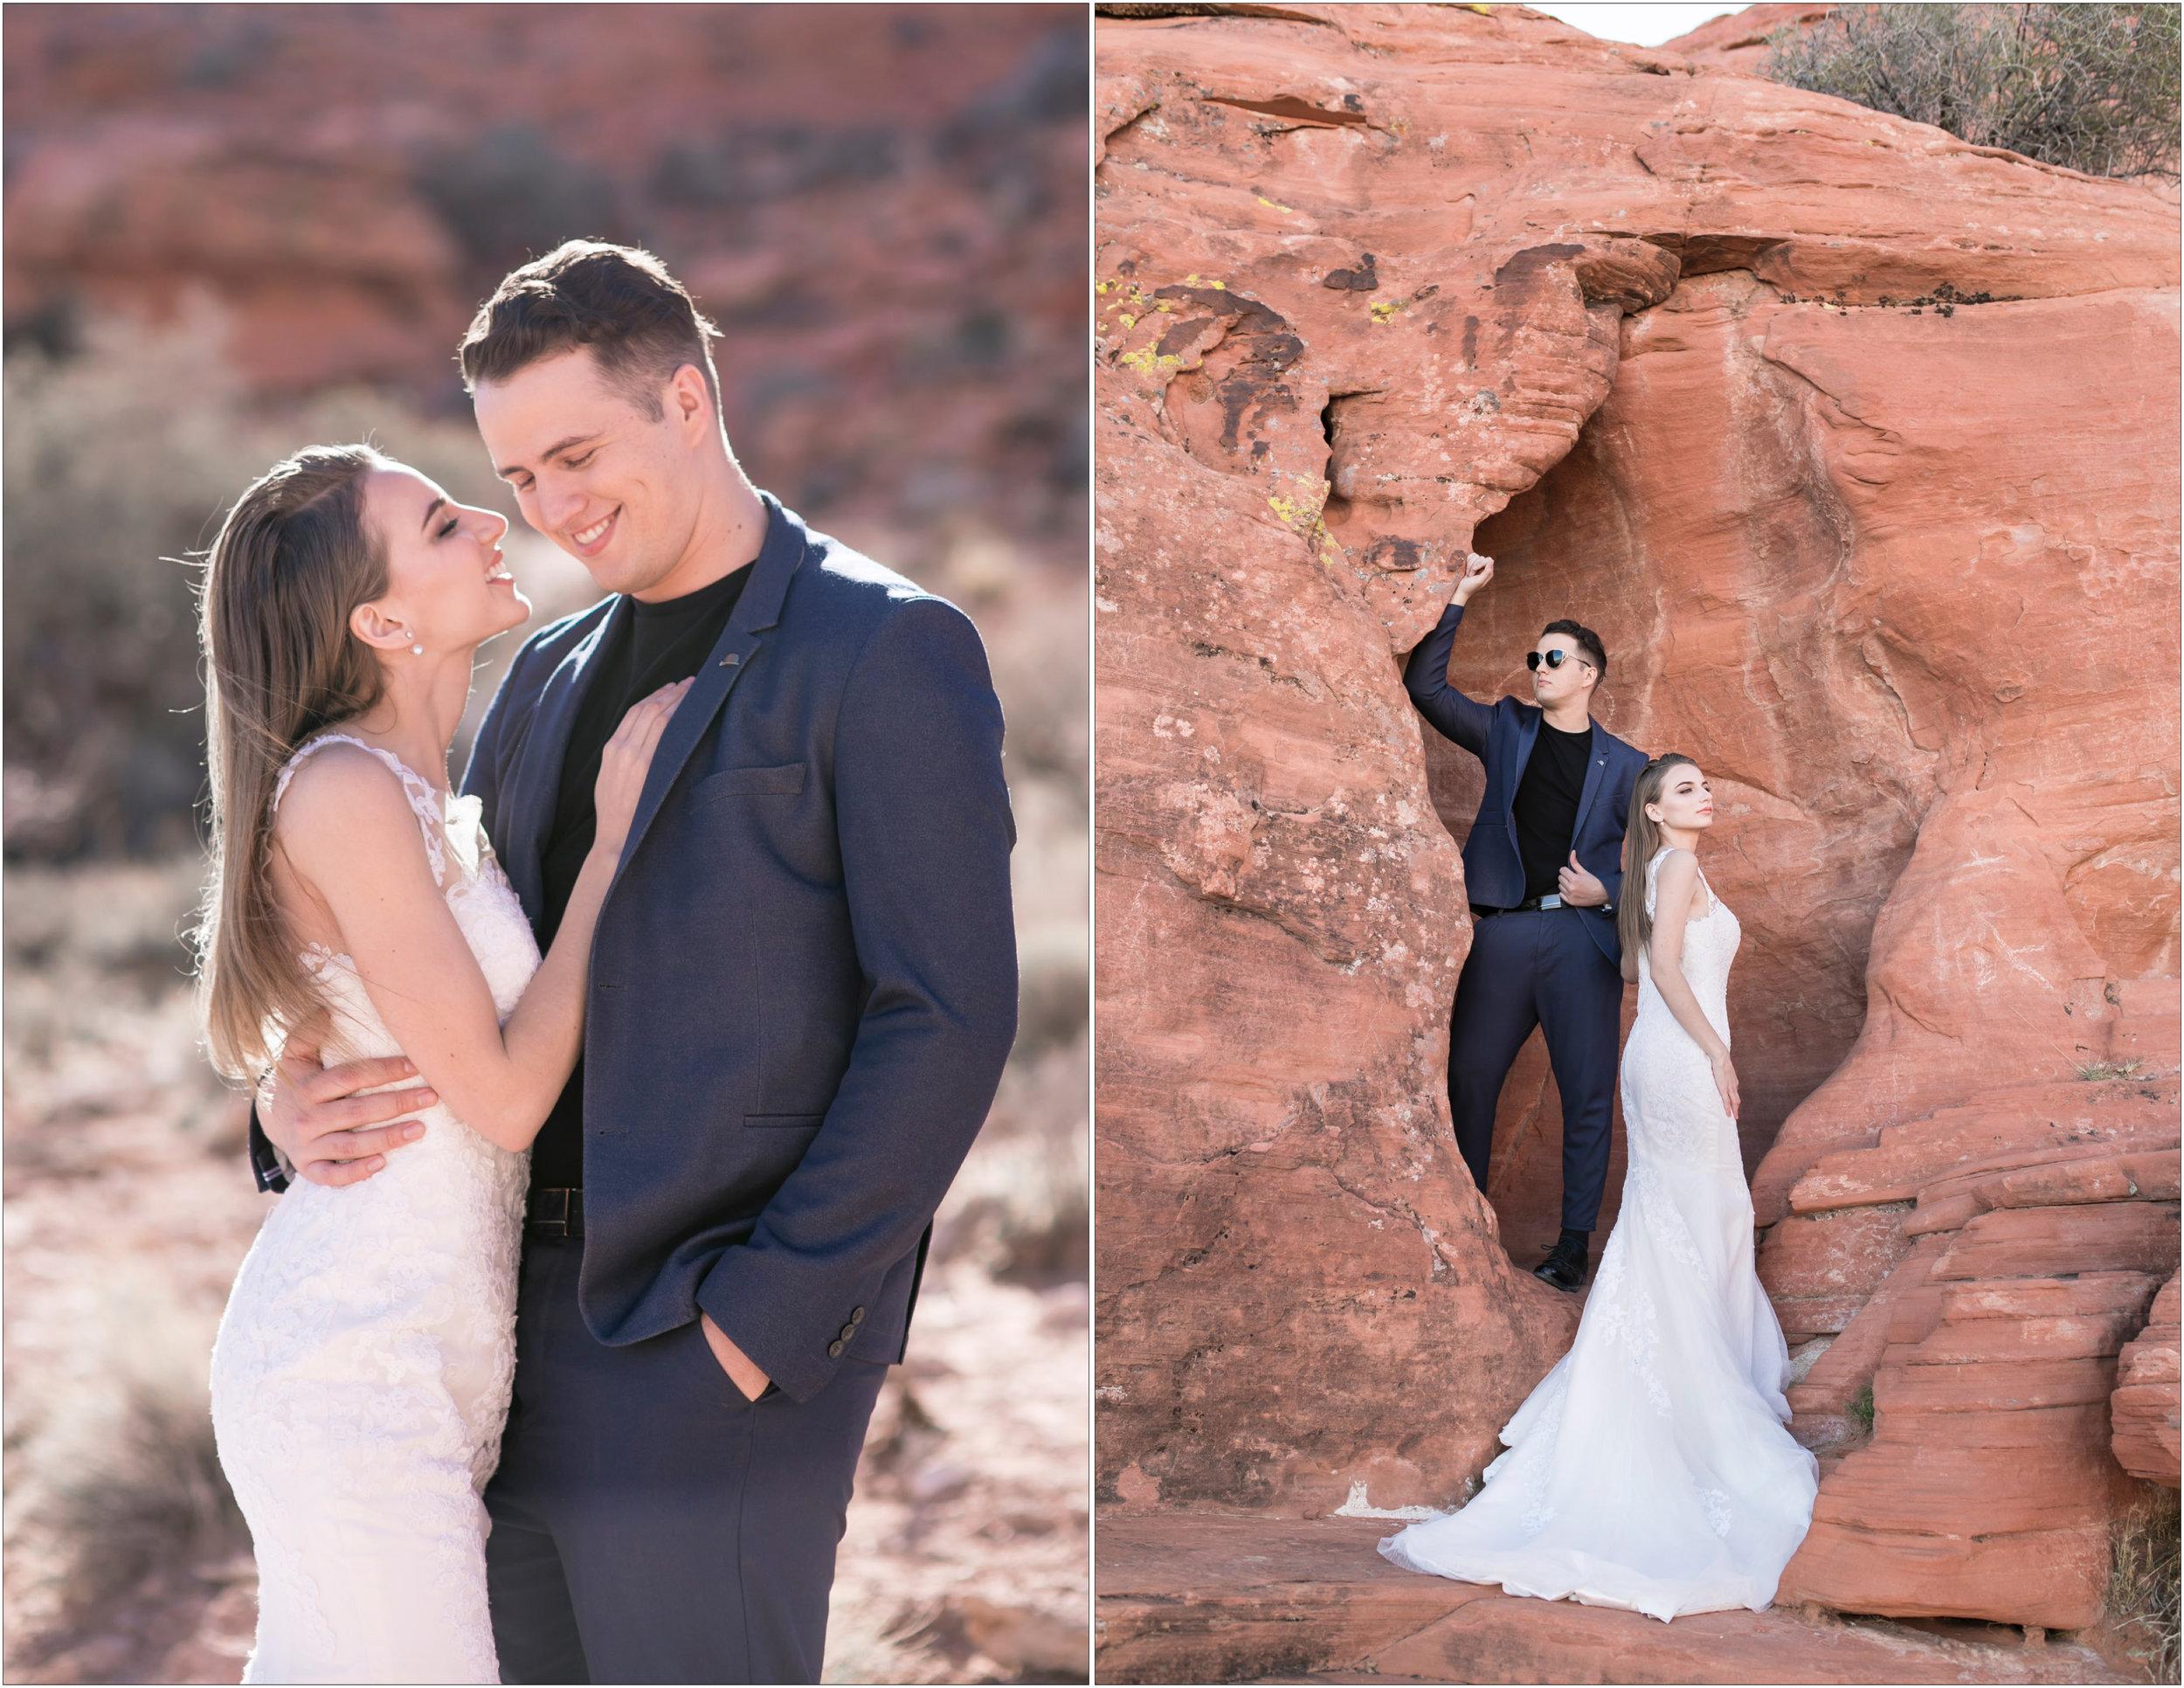 Michelle Chang Photography - San Francisco Wedding Photographer